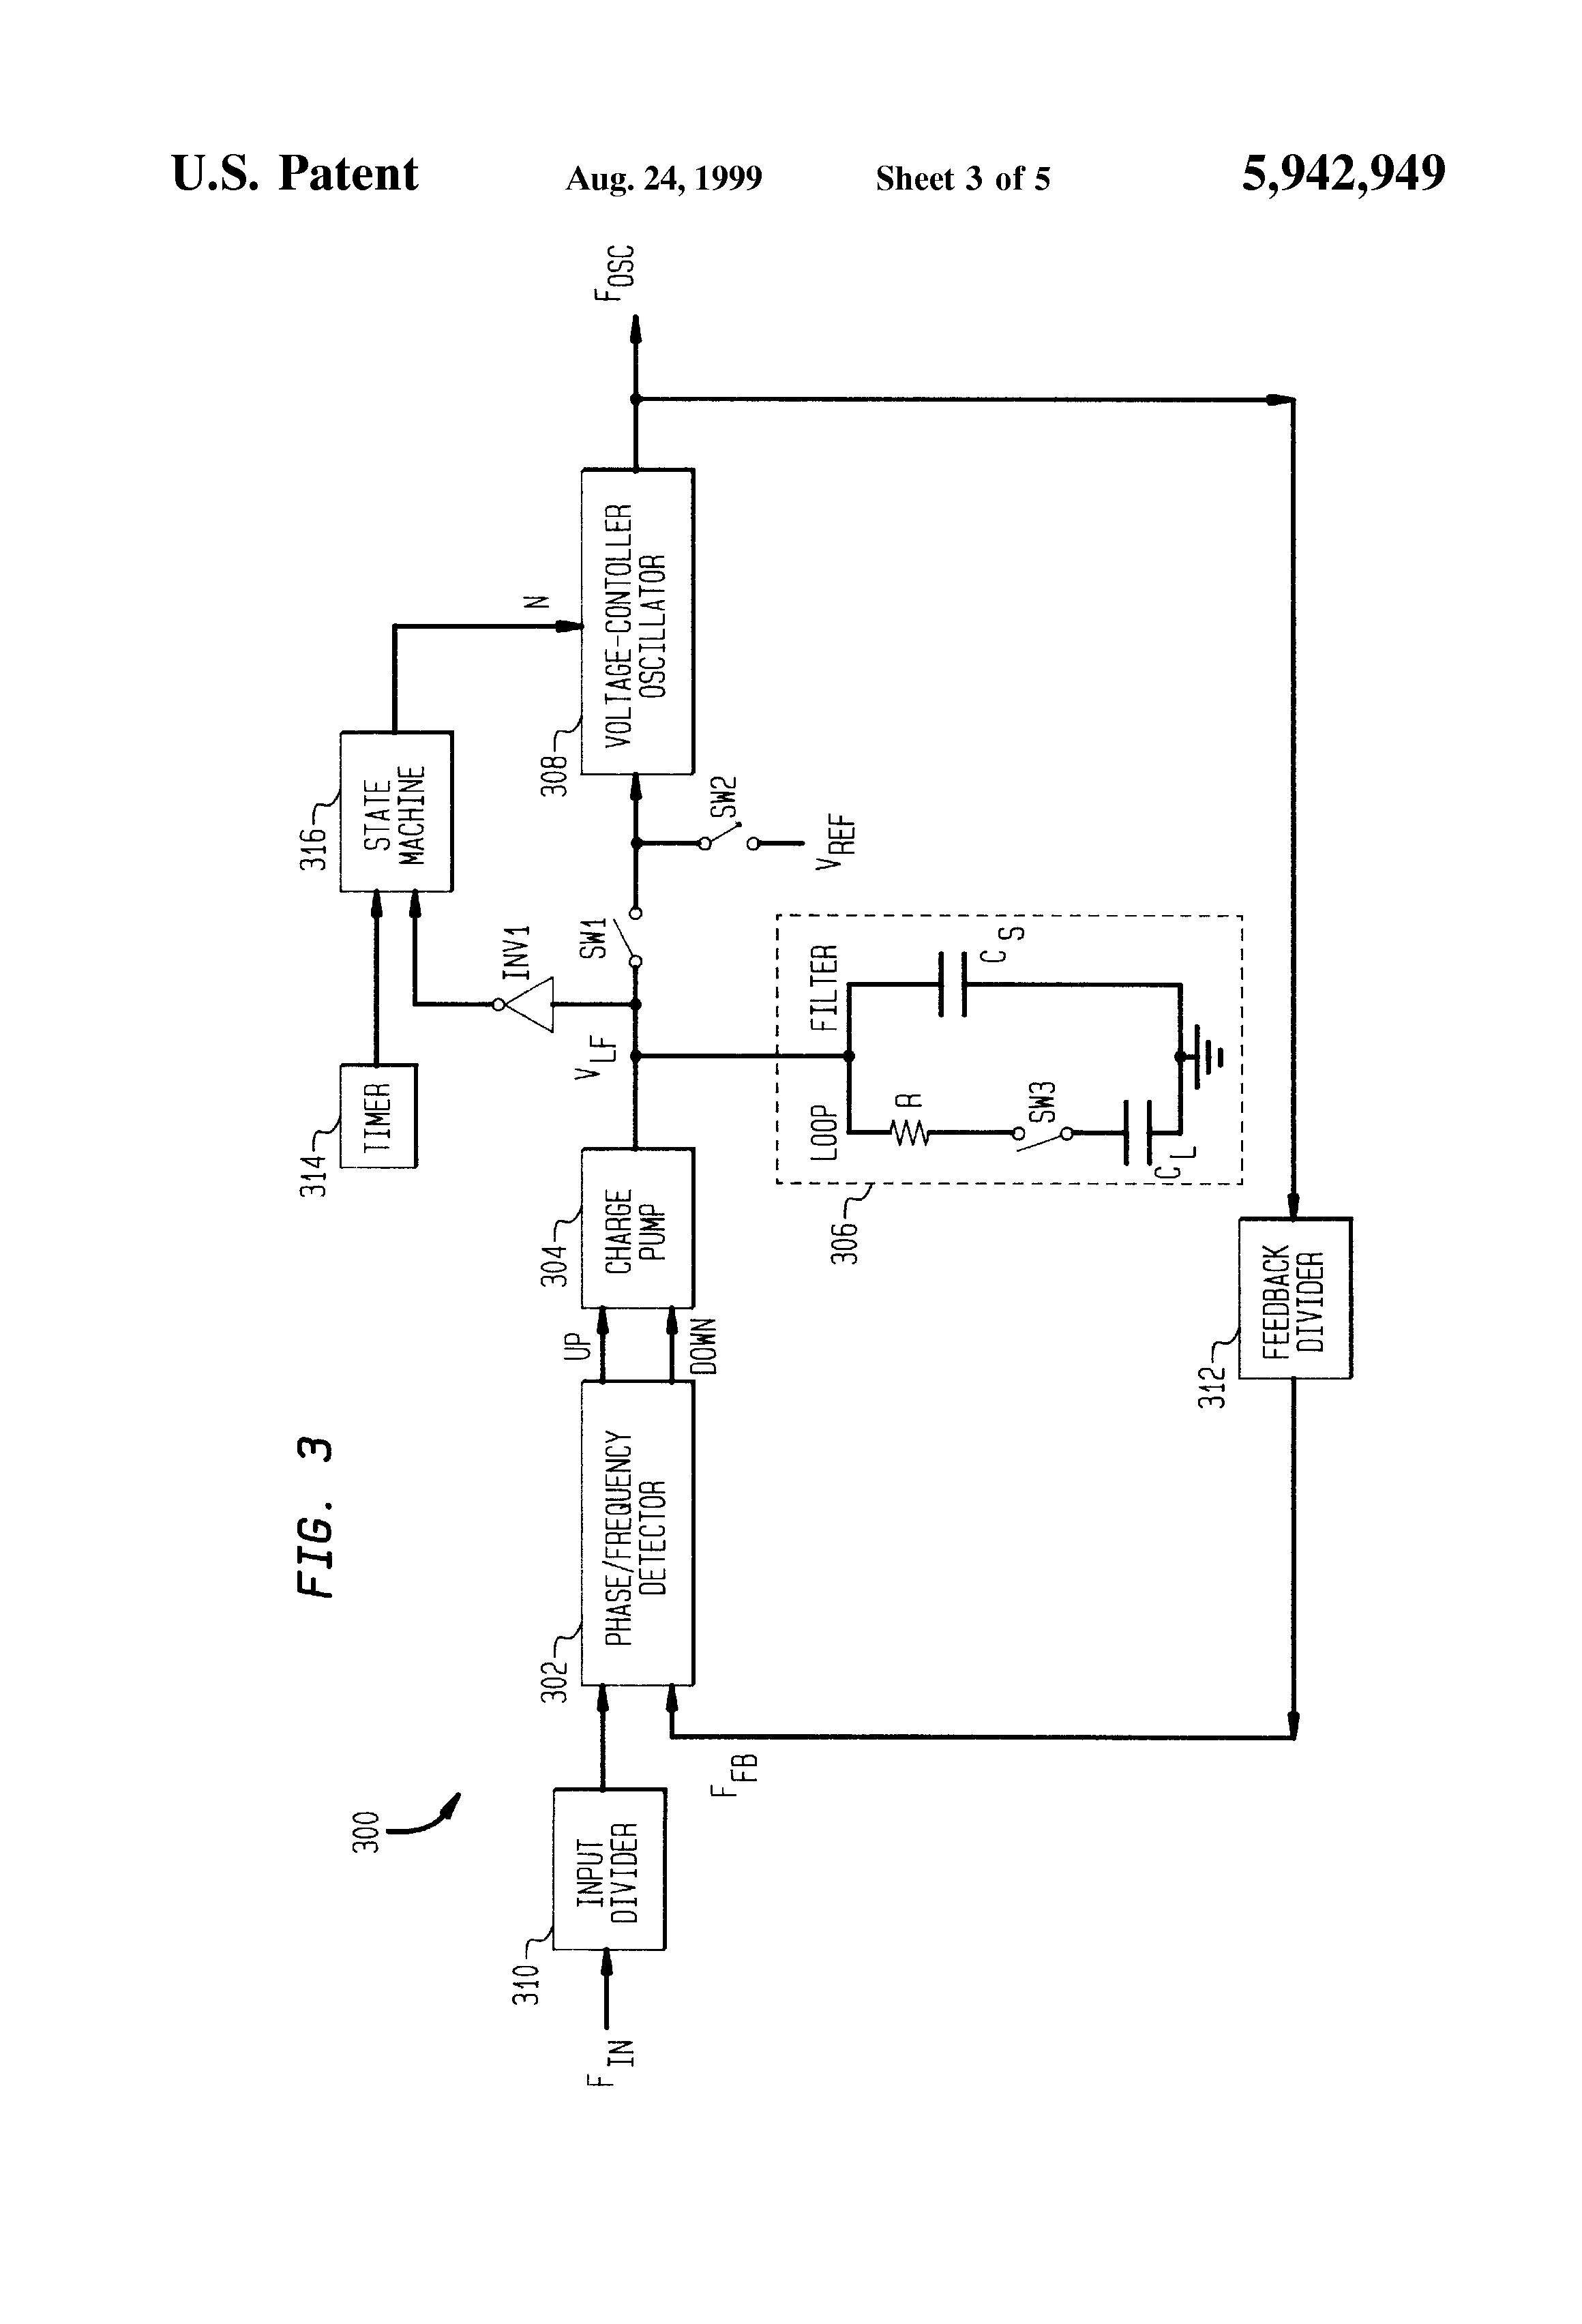 Patent Us5942949 Self Calibrating Phase Lock Loop With Auto Trim Locked Pll Operating Principle Block Diagram Showing Drawing